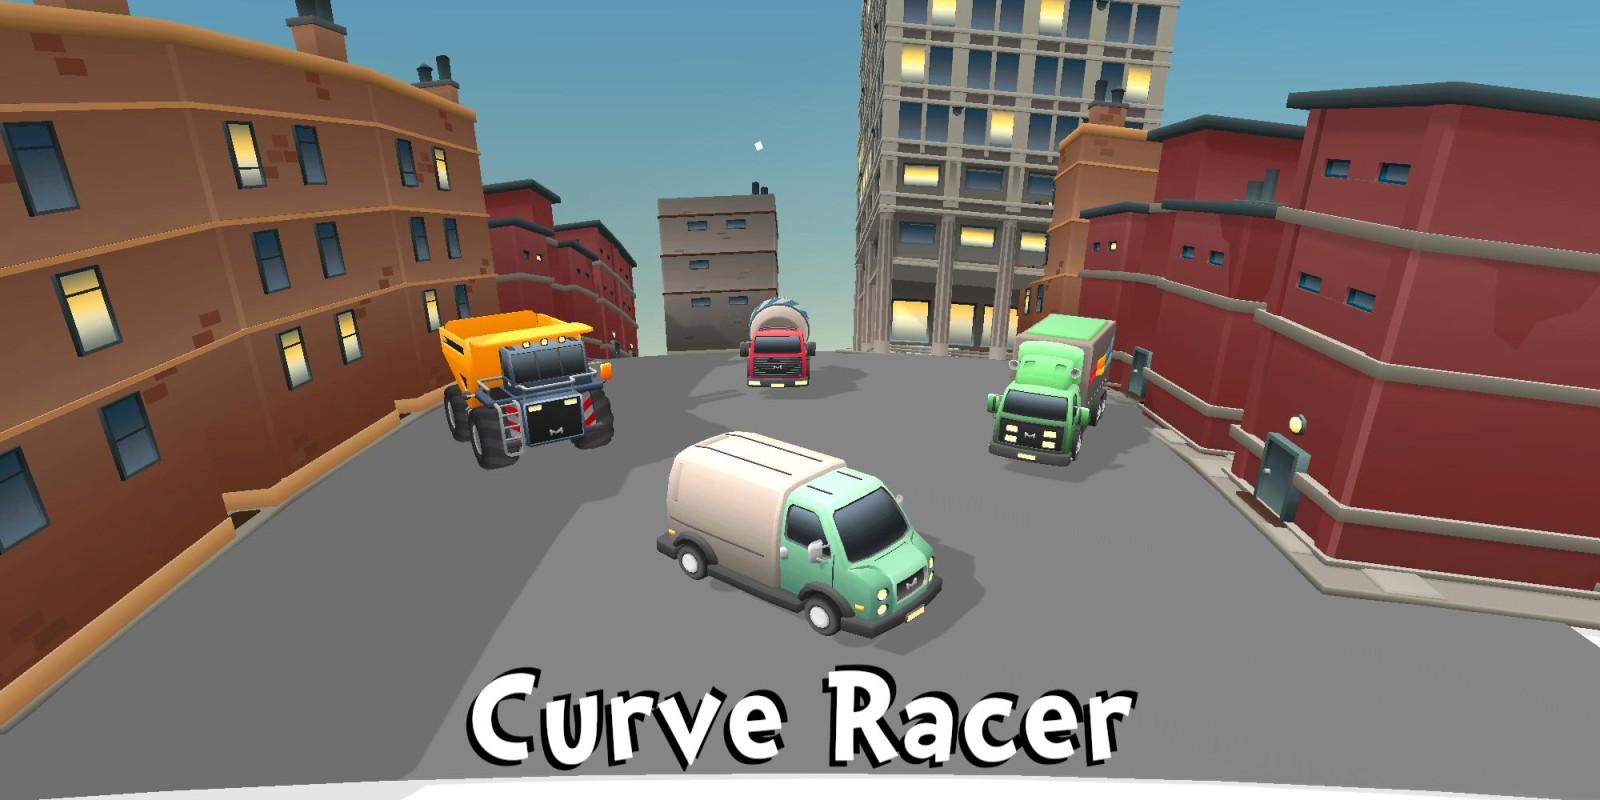 Curve Racer